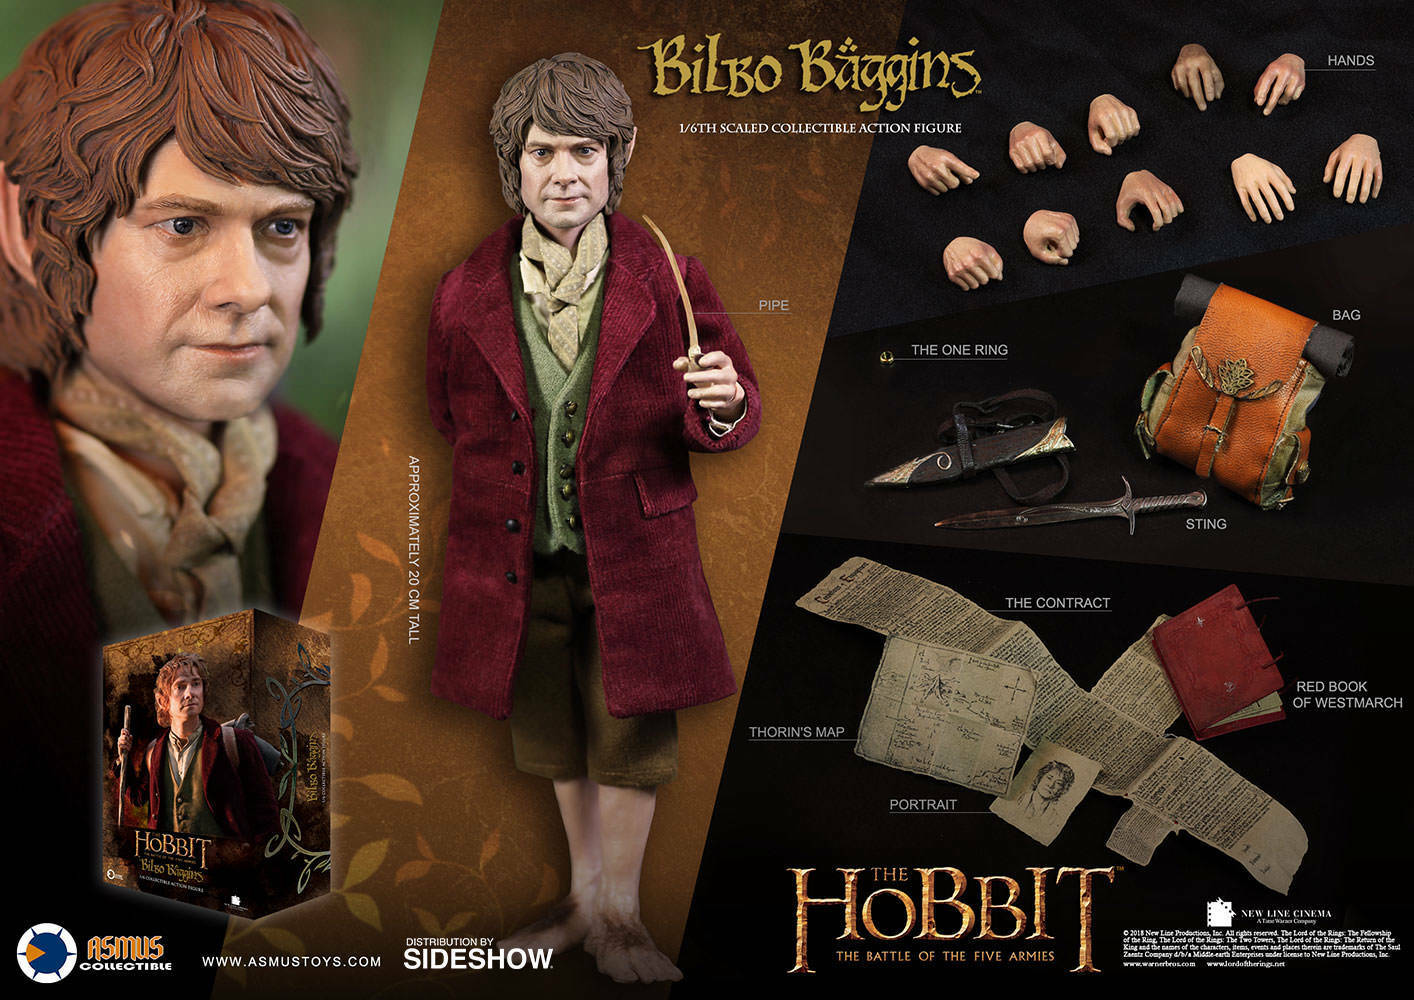 Asmus giocattoli Bilbo borsagins Hobbit LOTR Lord Of The  Rings Series 1 6 Scale cifra  risposta prima volta